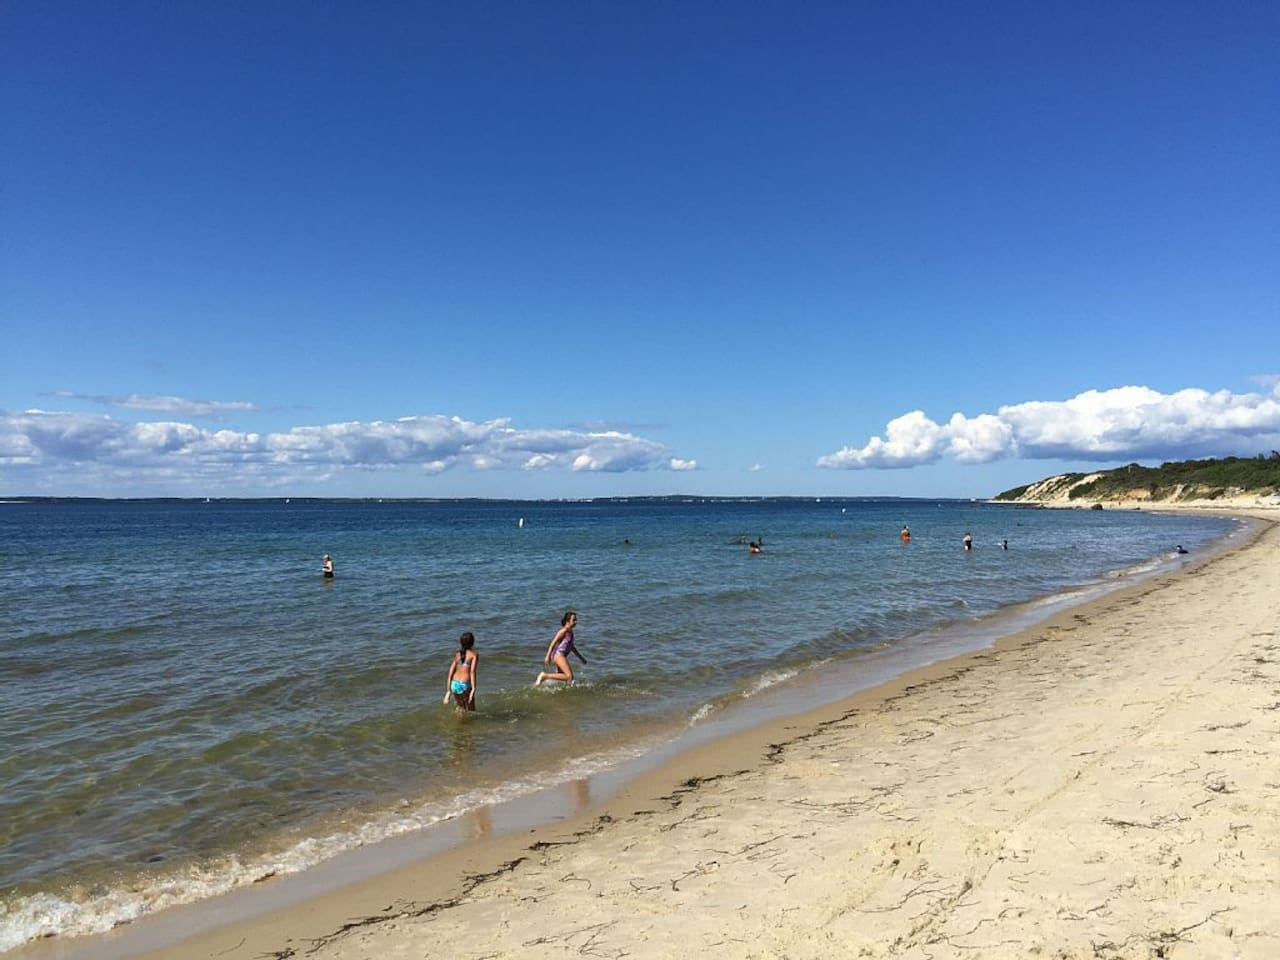 Lambert's Cove Beach, five minutes away, has calm ocean swimming and amazing sunsets.